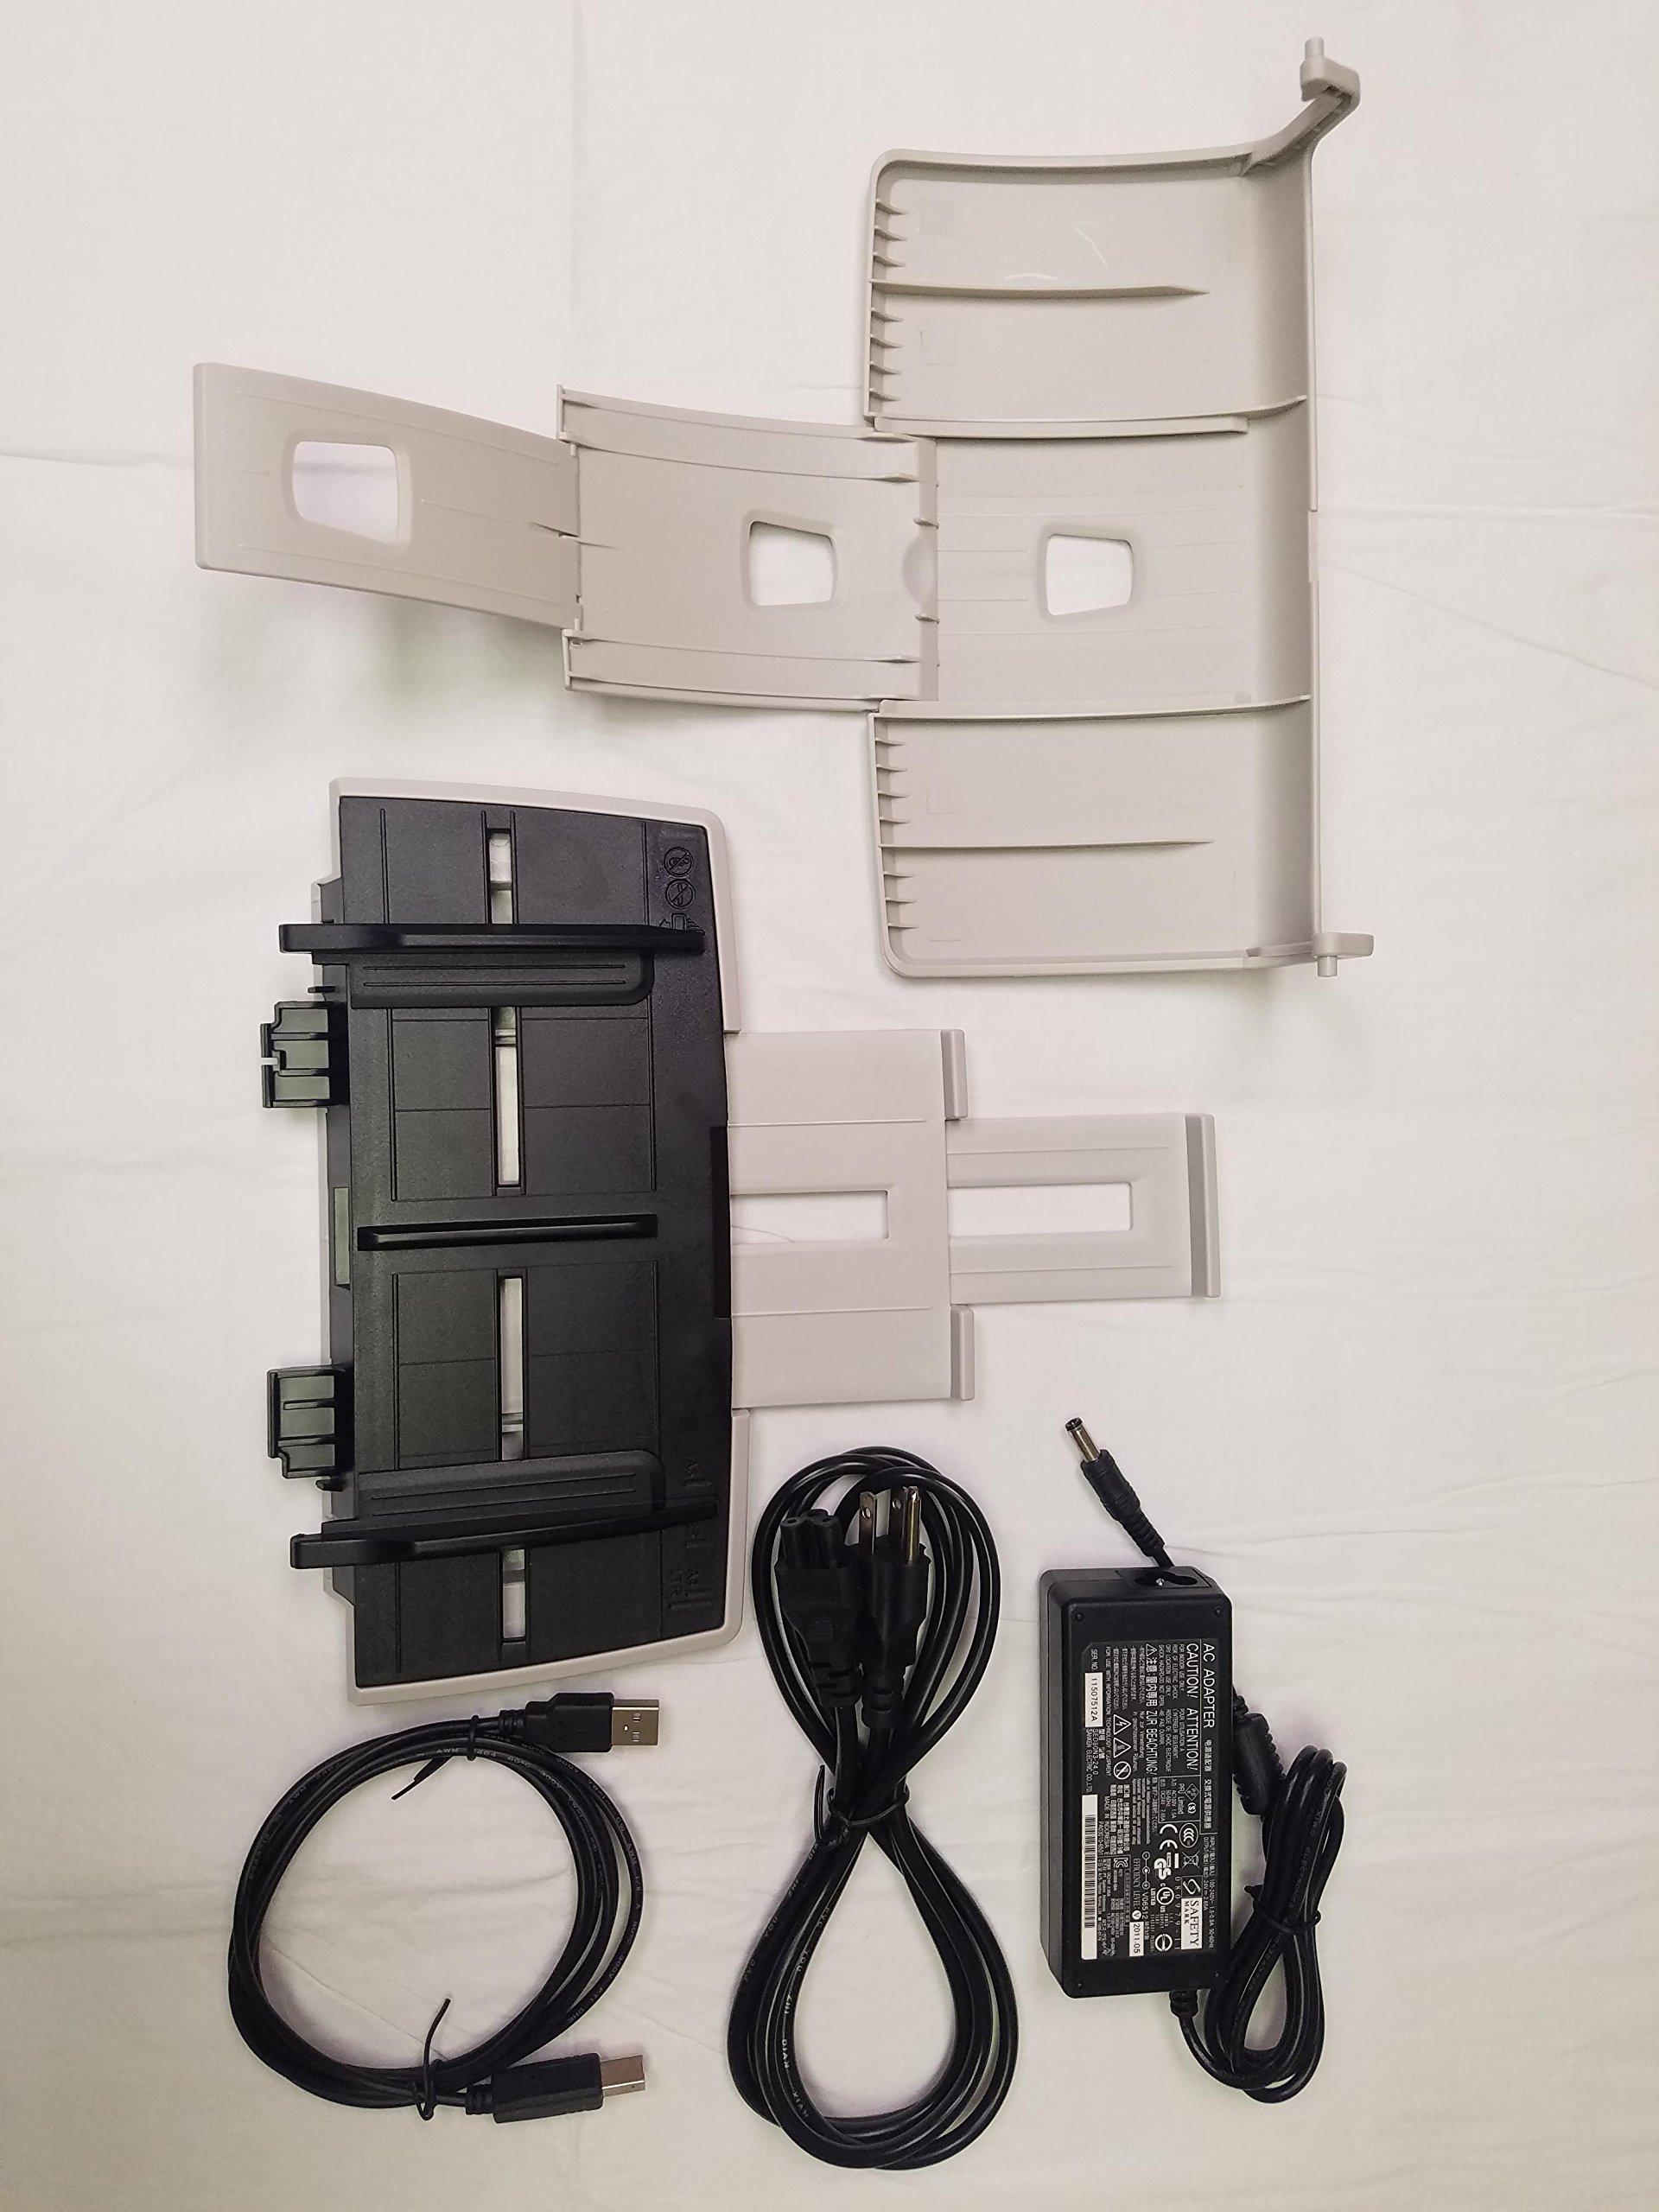 Fujitsu Scanner Accessory Kit for fi-6130, fi-6130z, fi-6140, fi-6140z, fi-6240 models